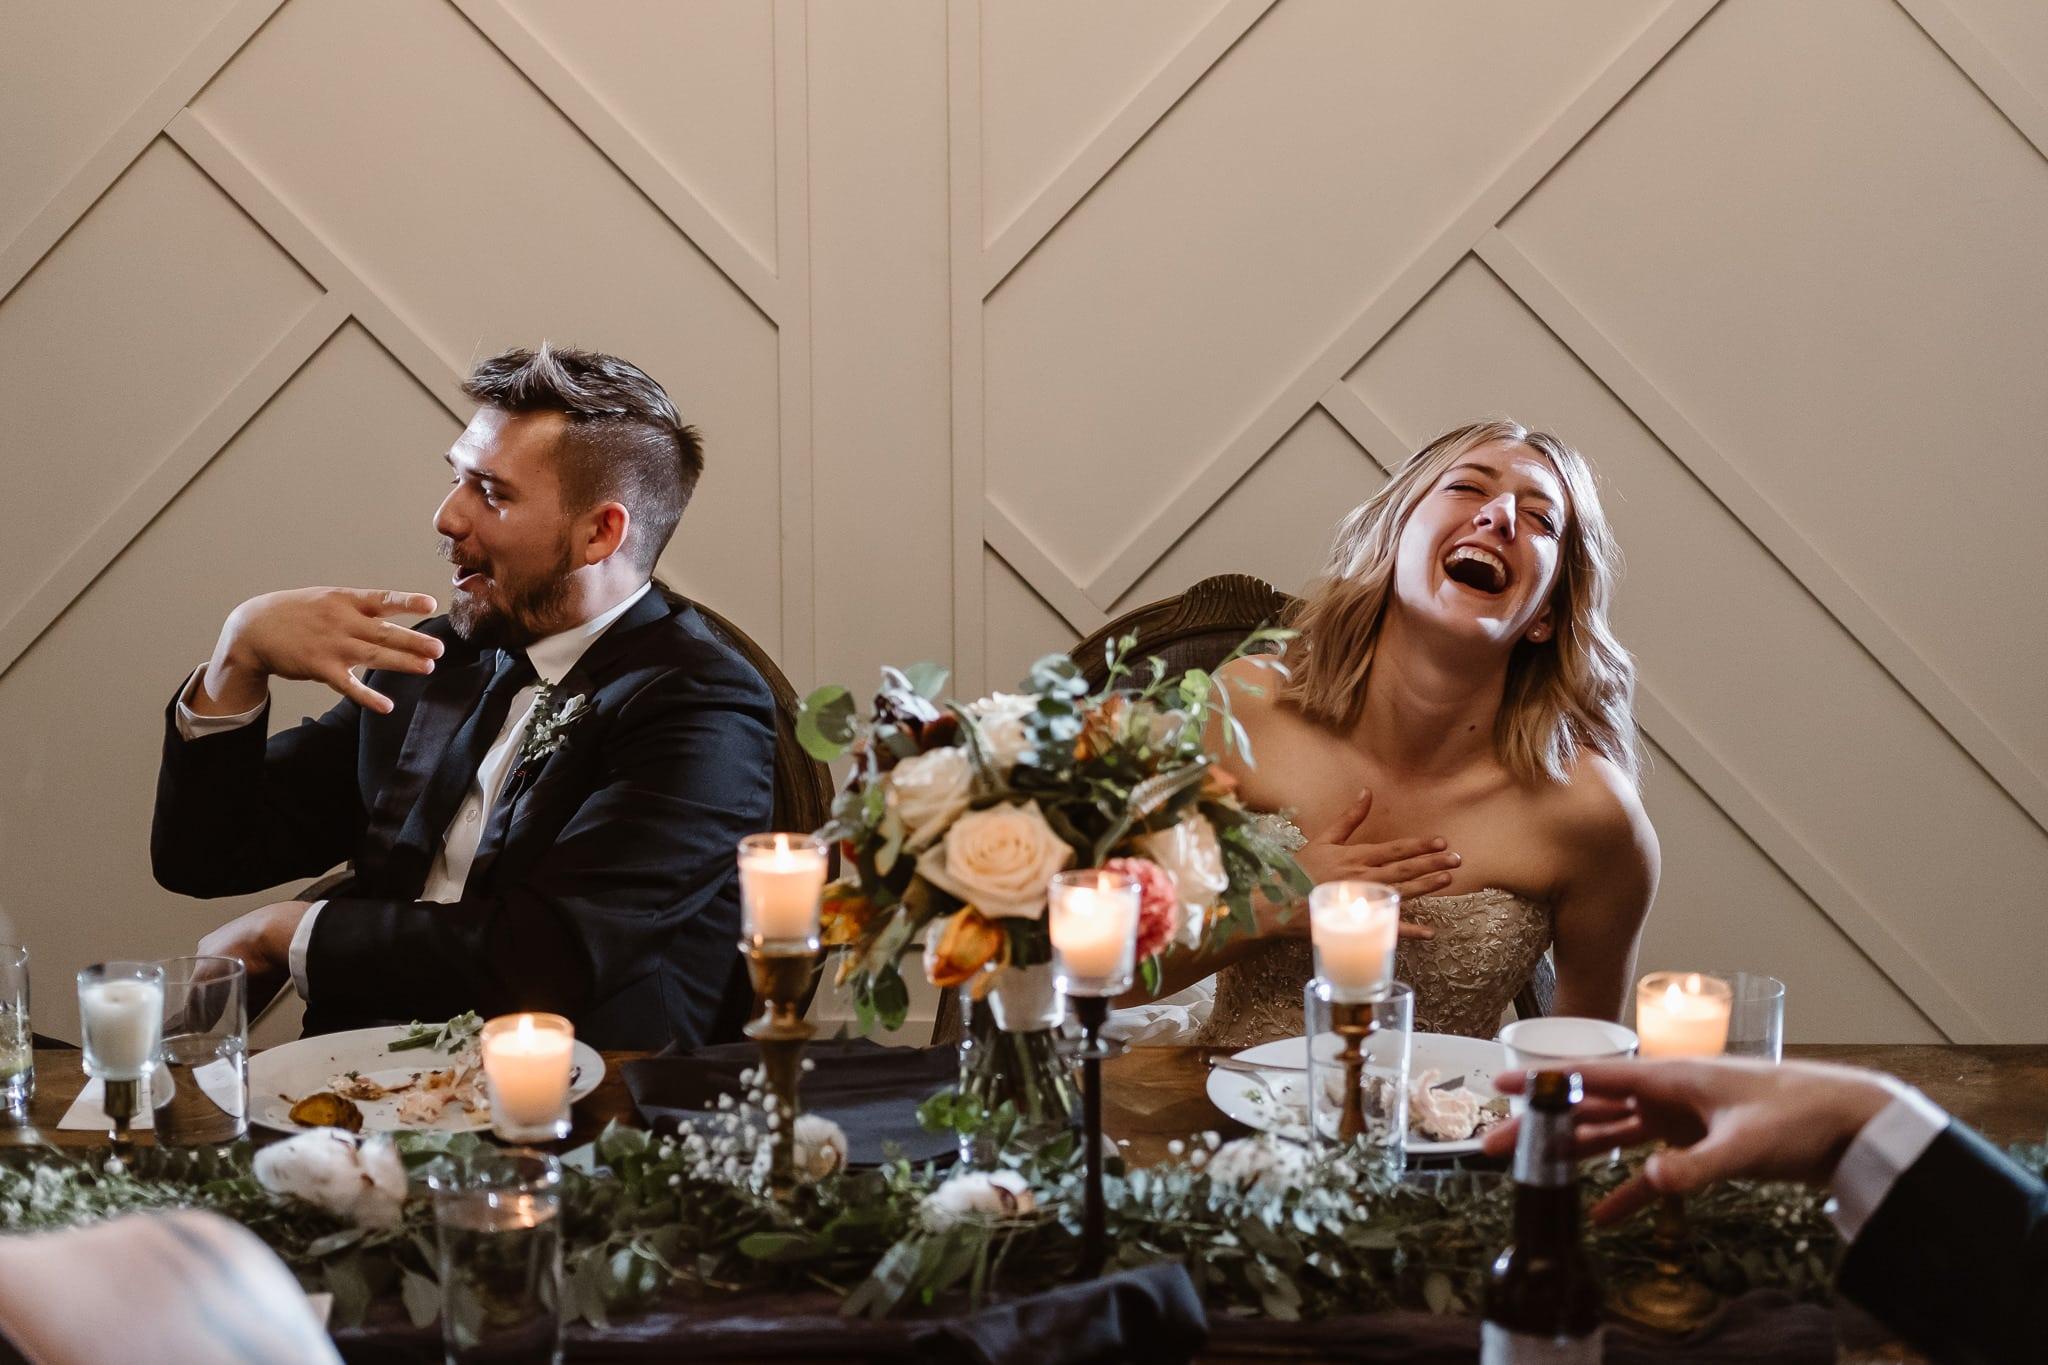 St Vrain Wedding Photographer | Longmont Wedding Photographer | Colorado Winter Wedding Photographer, Colorado industrial chic wedding ceremony, wedding toasts